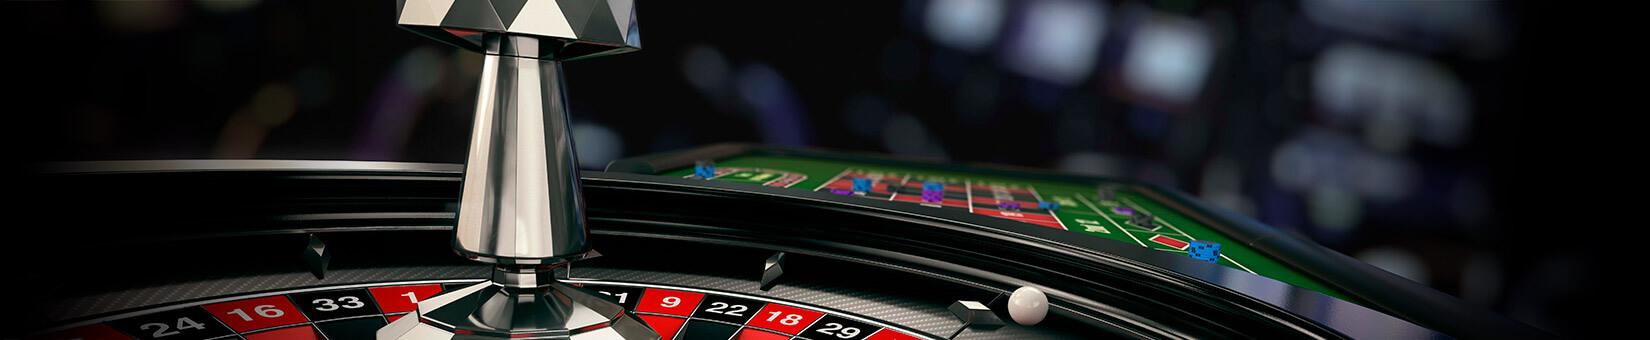 Mest berømte kasinoer - 44237